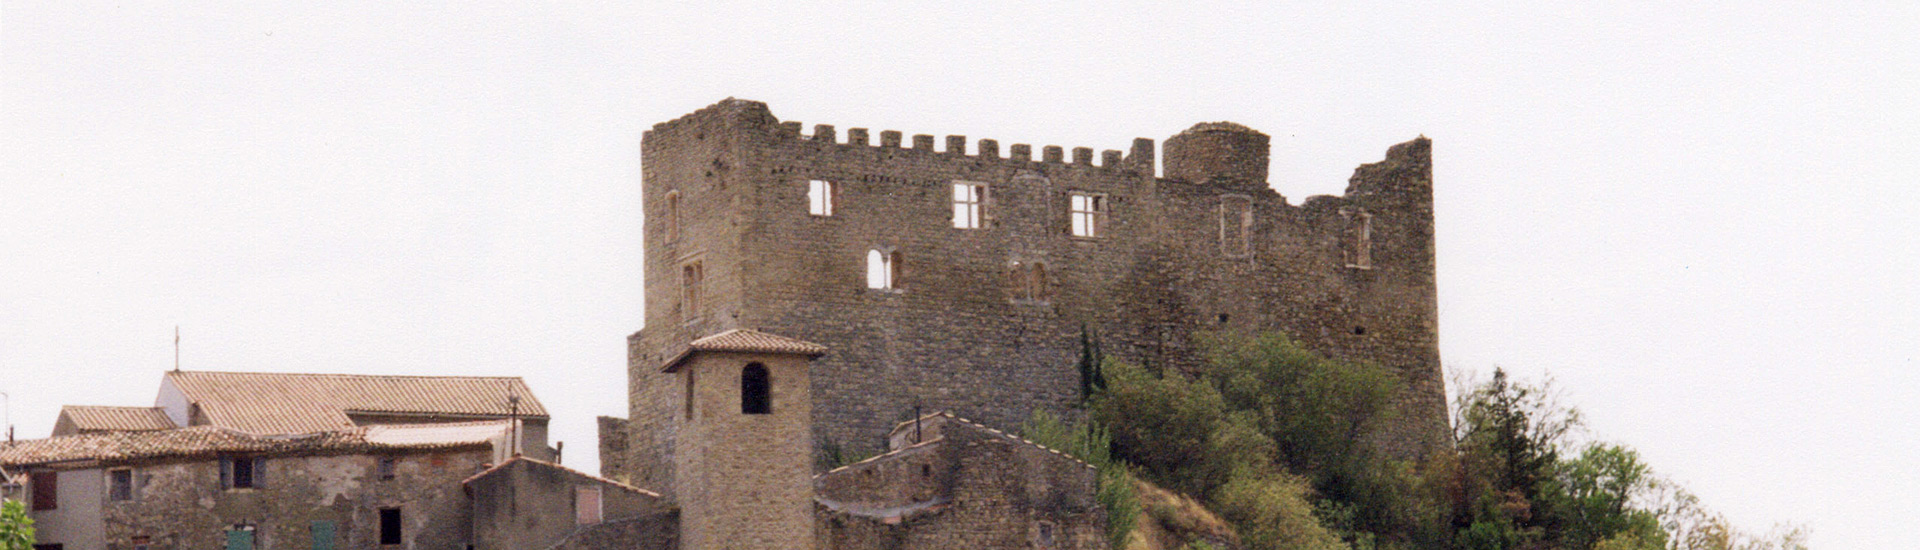 Chateau de Durban